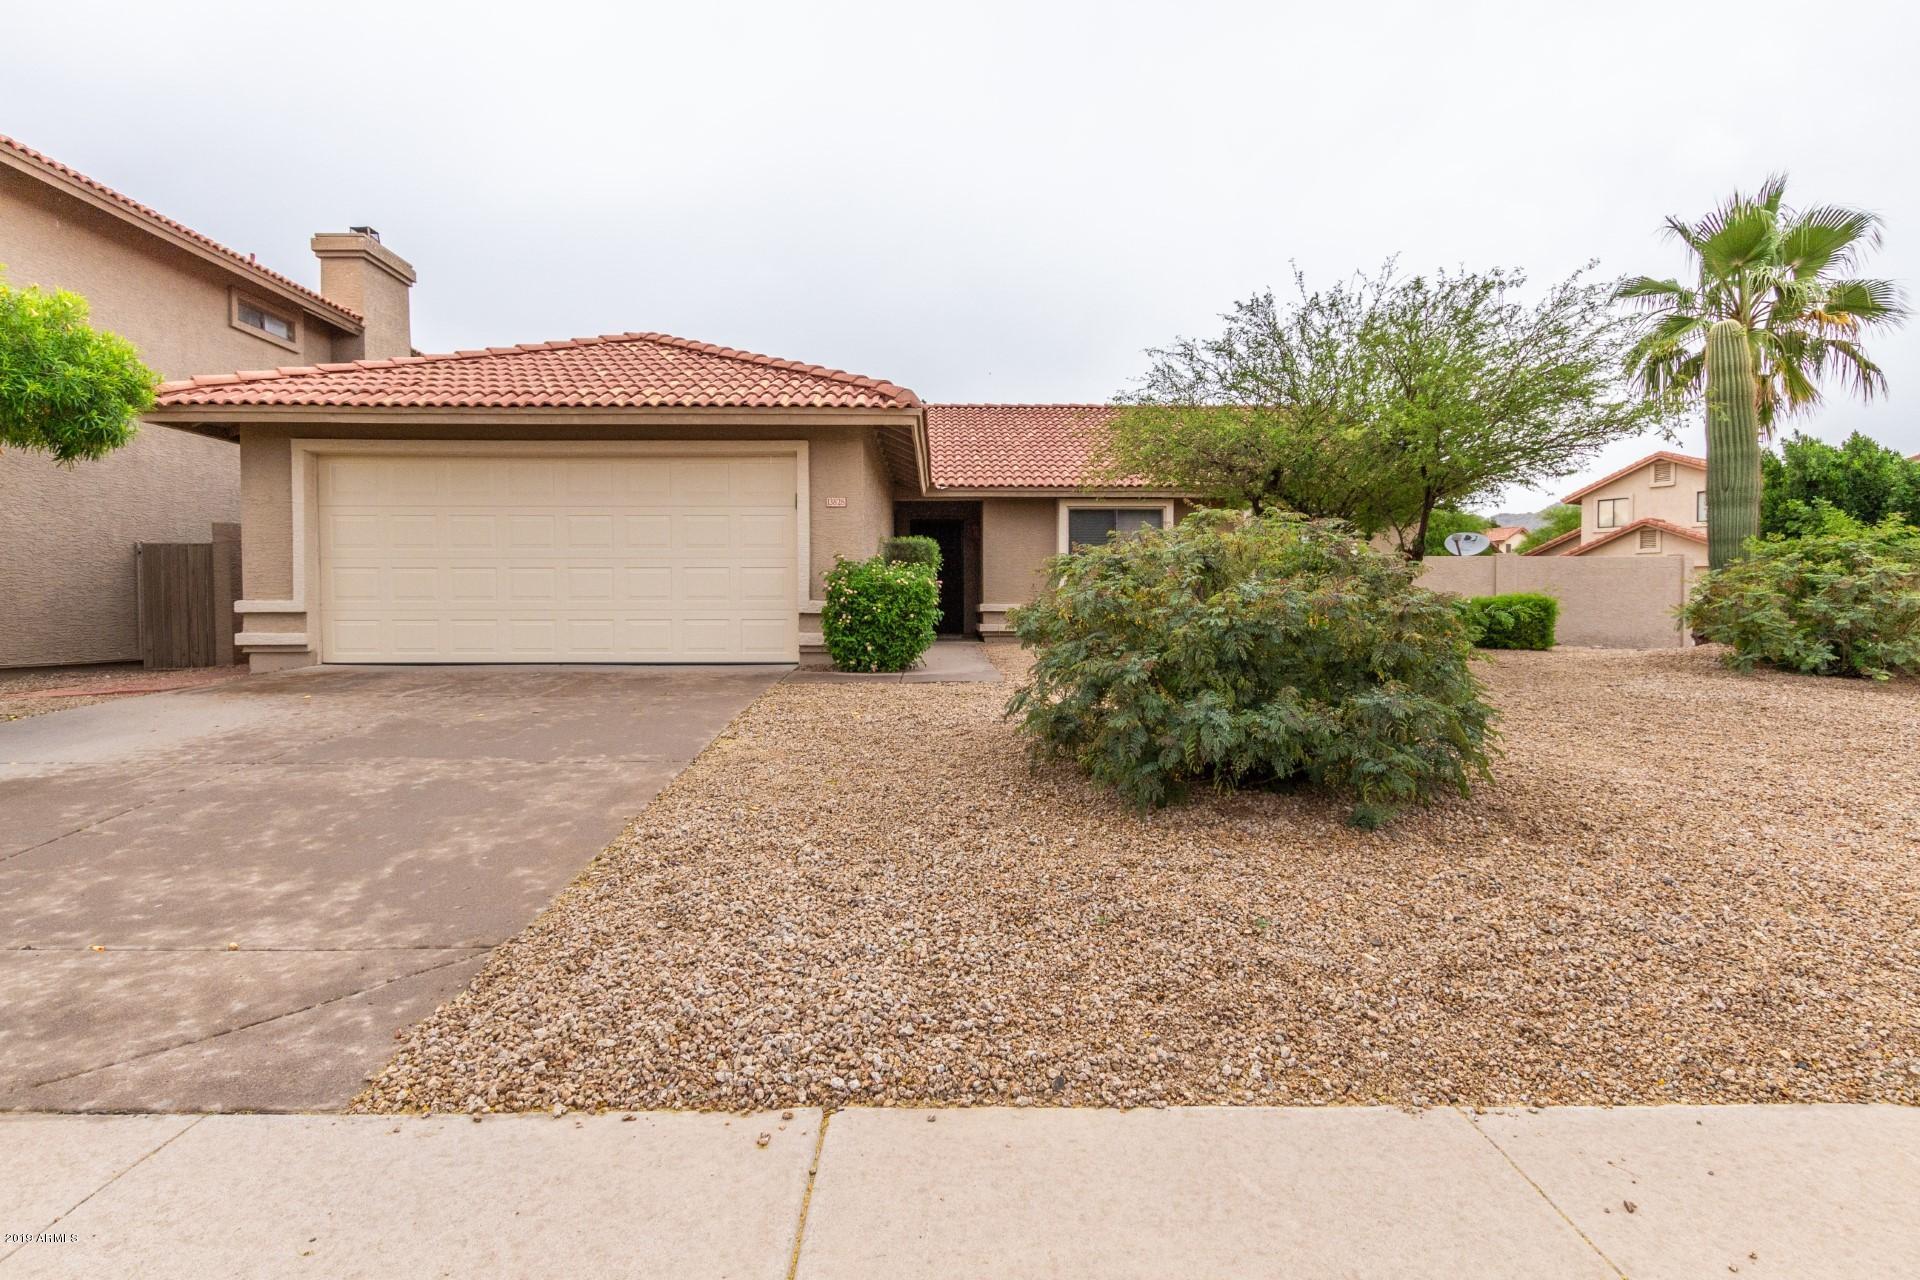 Photo of 13828 S 36th Way, Phoenix, AZ 85044